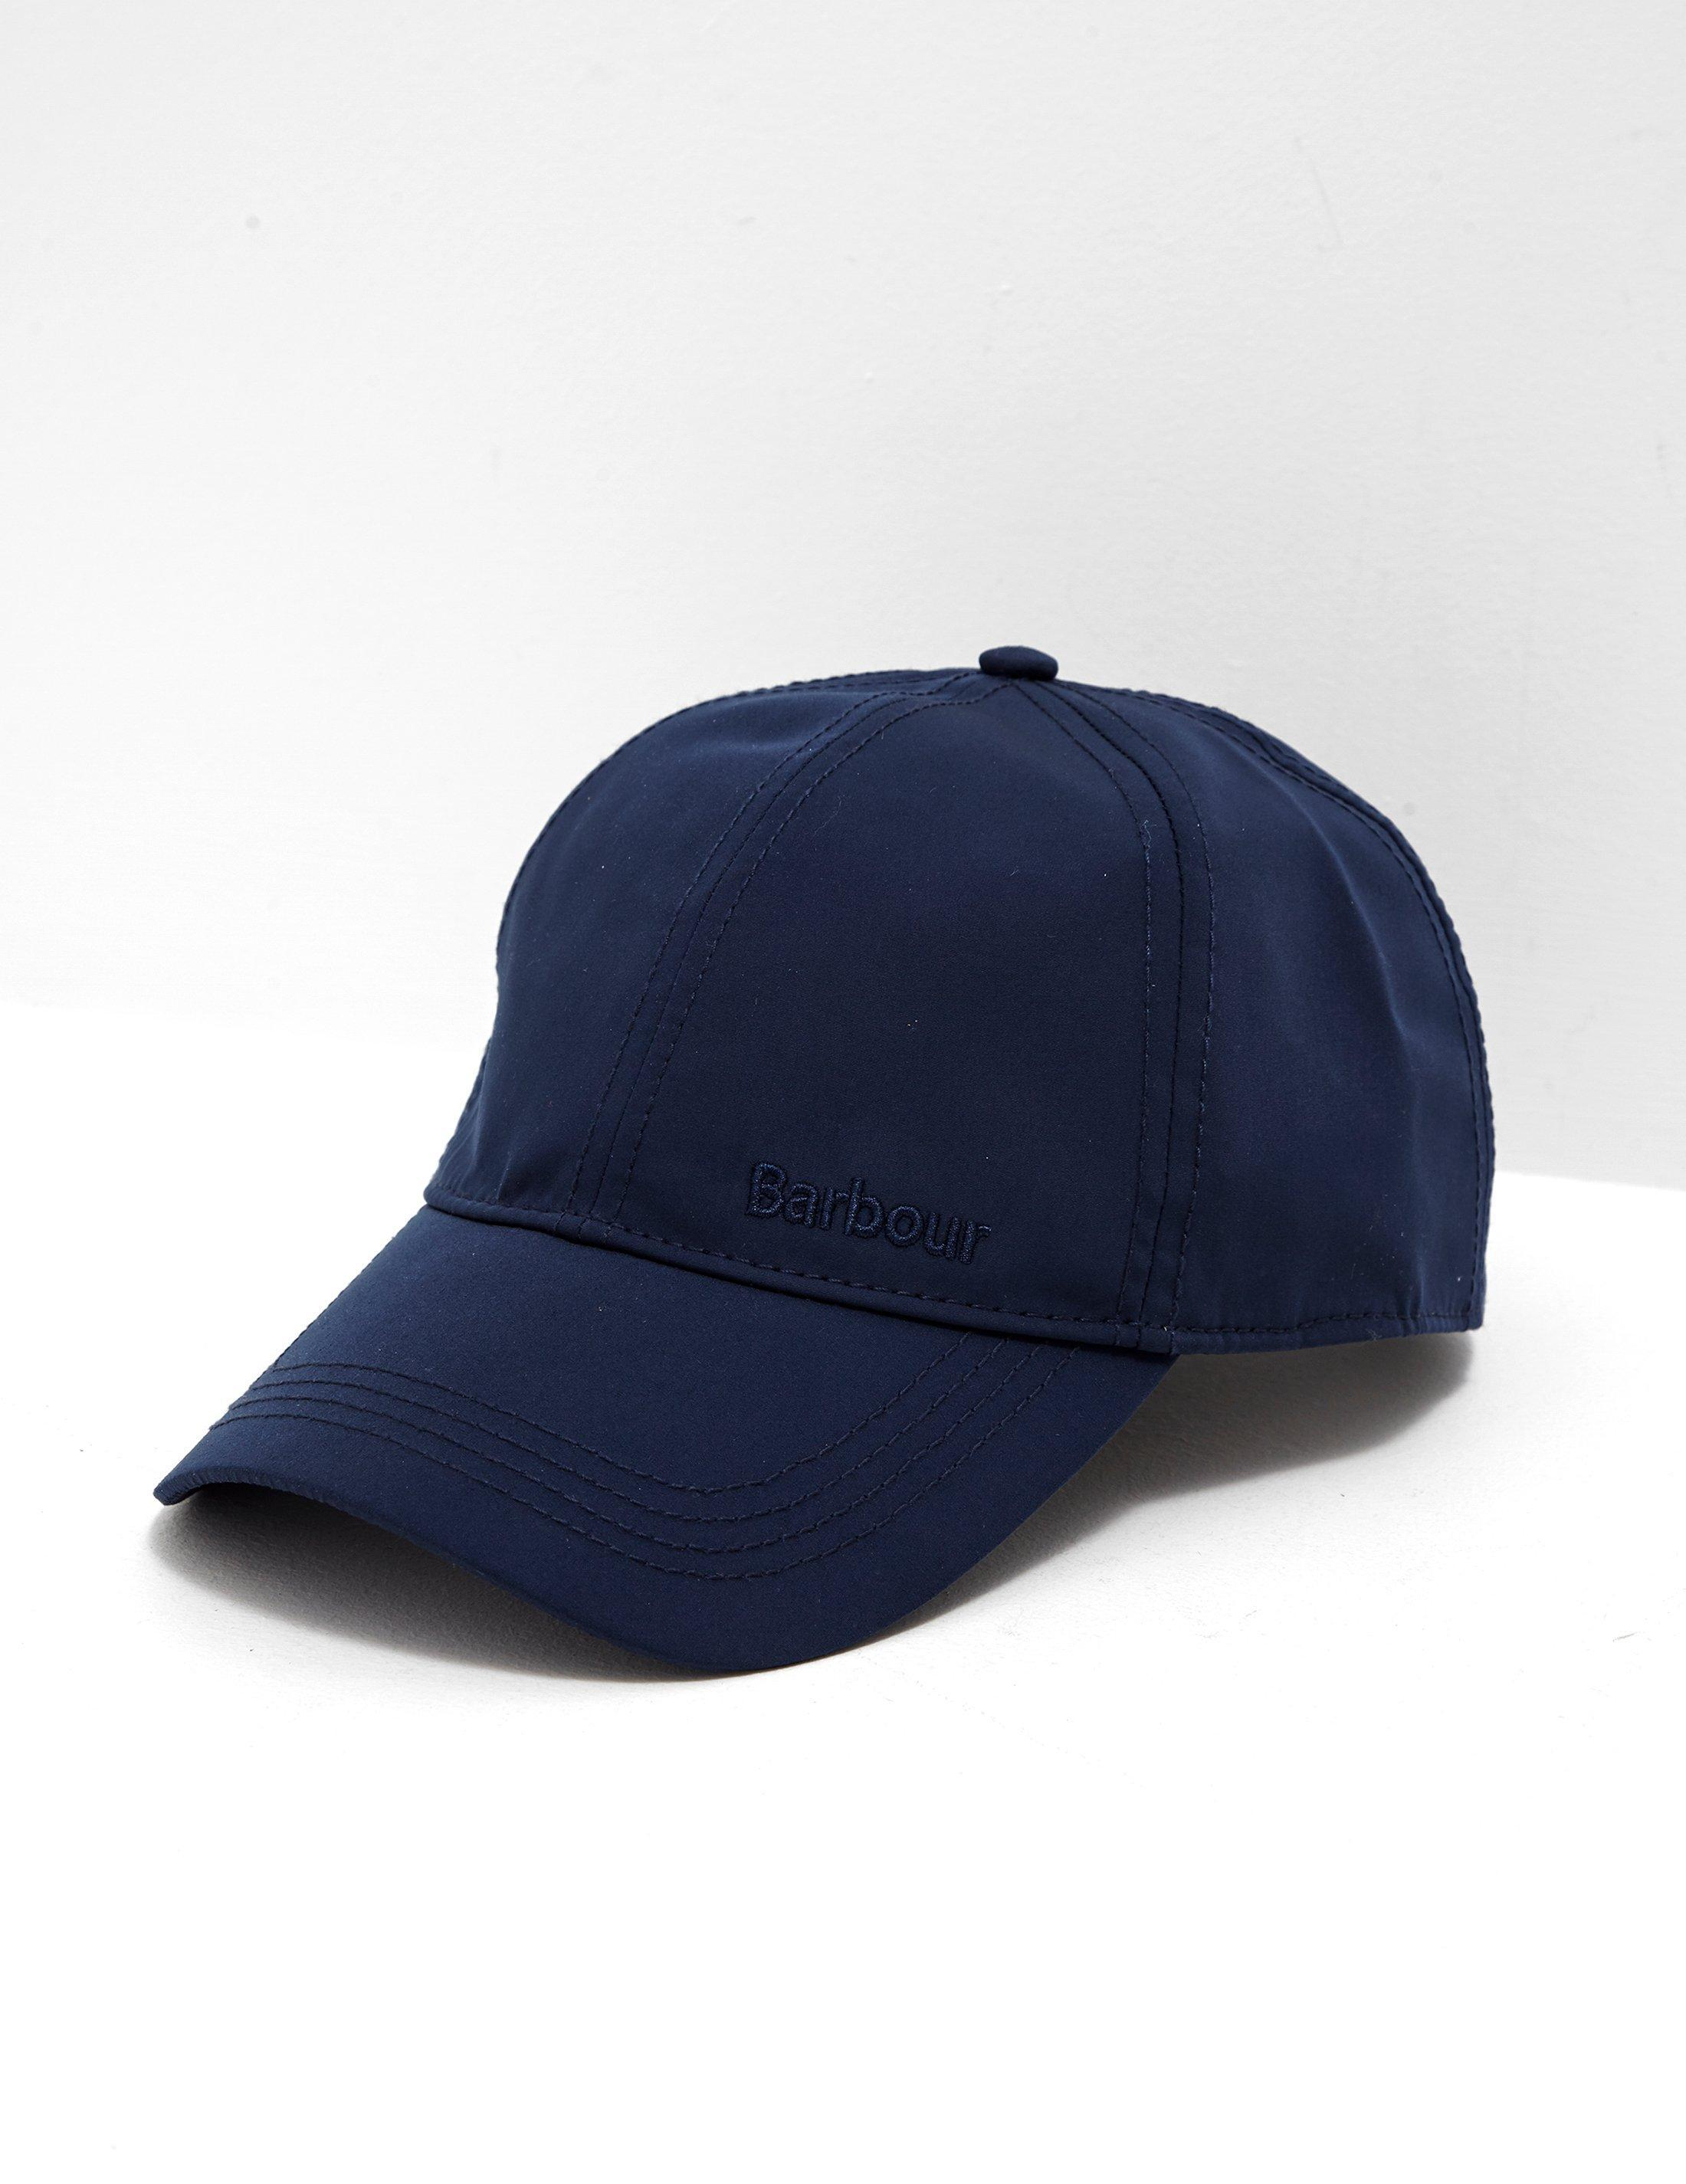 Barbour Mens Berwick Cap Navy Blue in Blue for Men - Lyst 873602aeda48